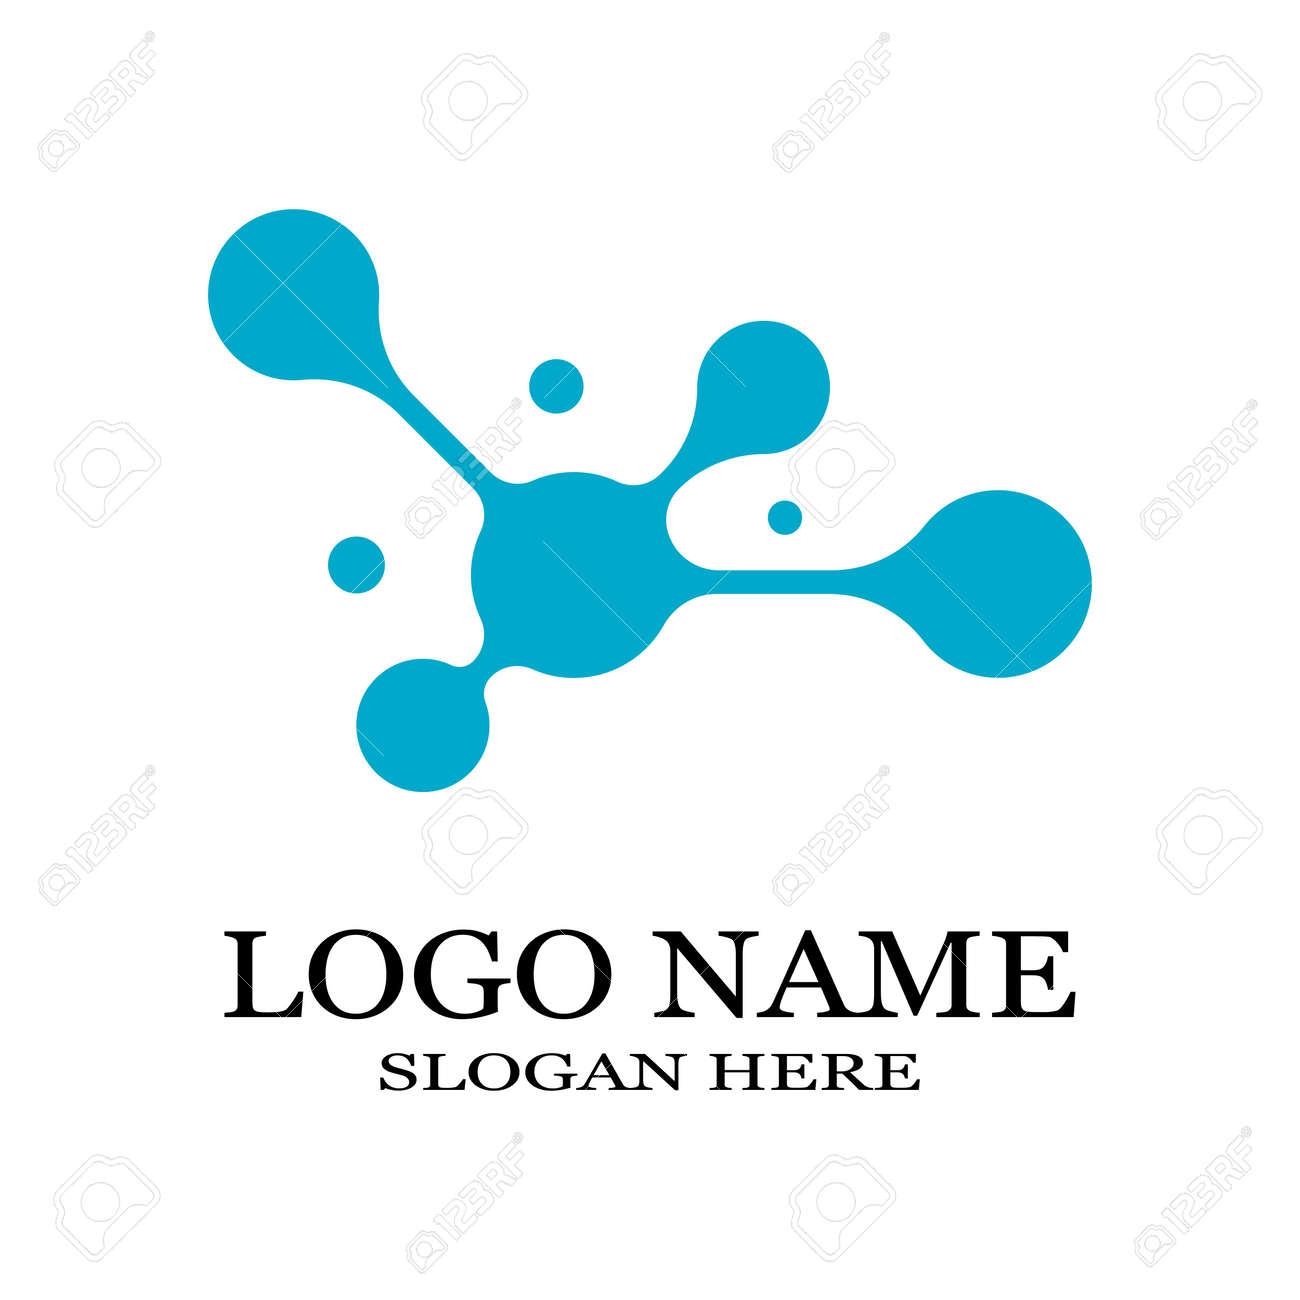 Molecule symbol logo template vector illustration design - 166098041